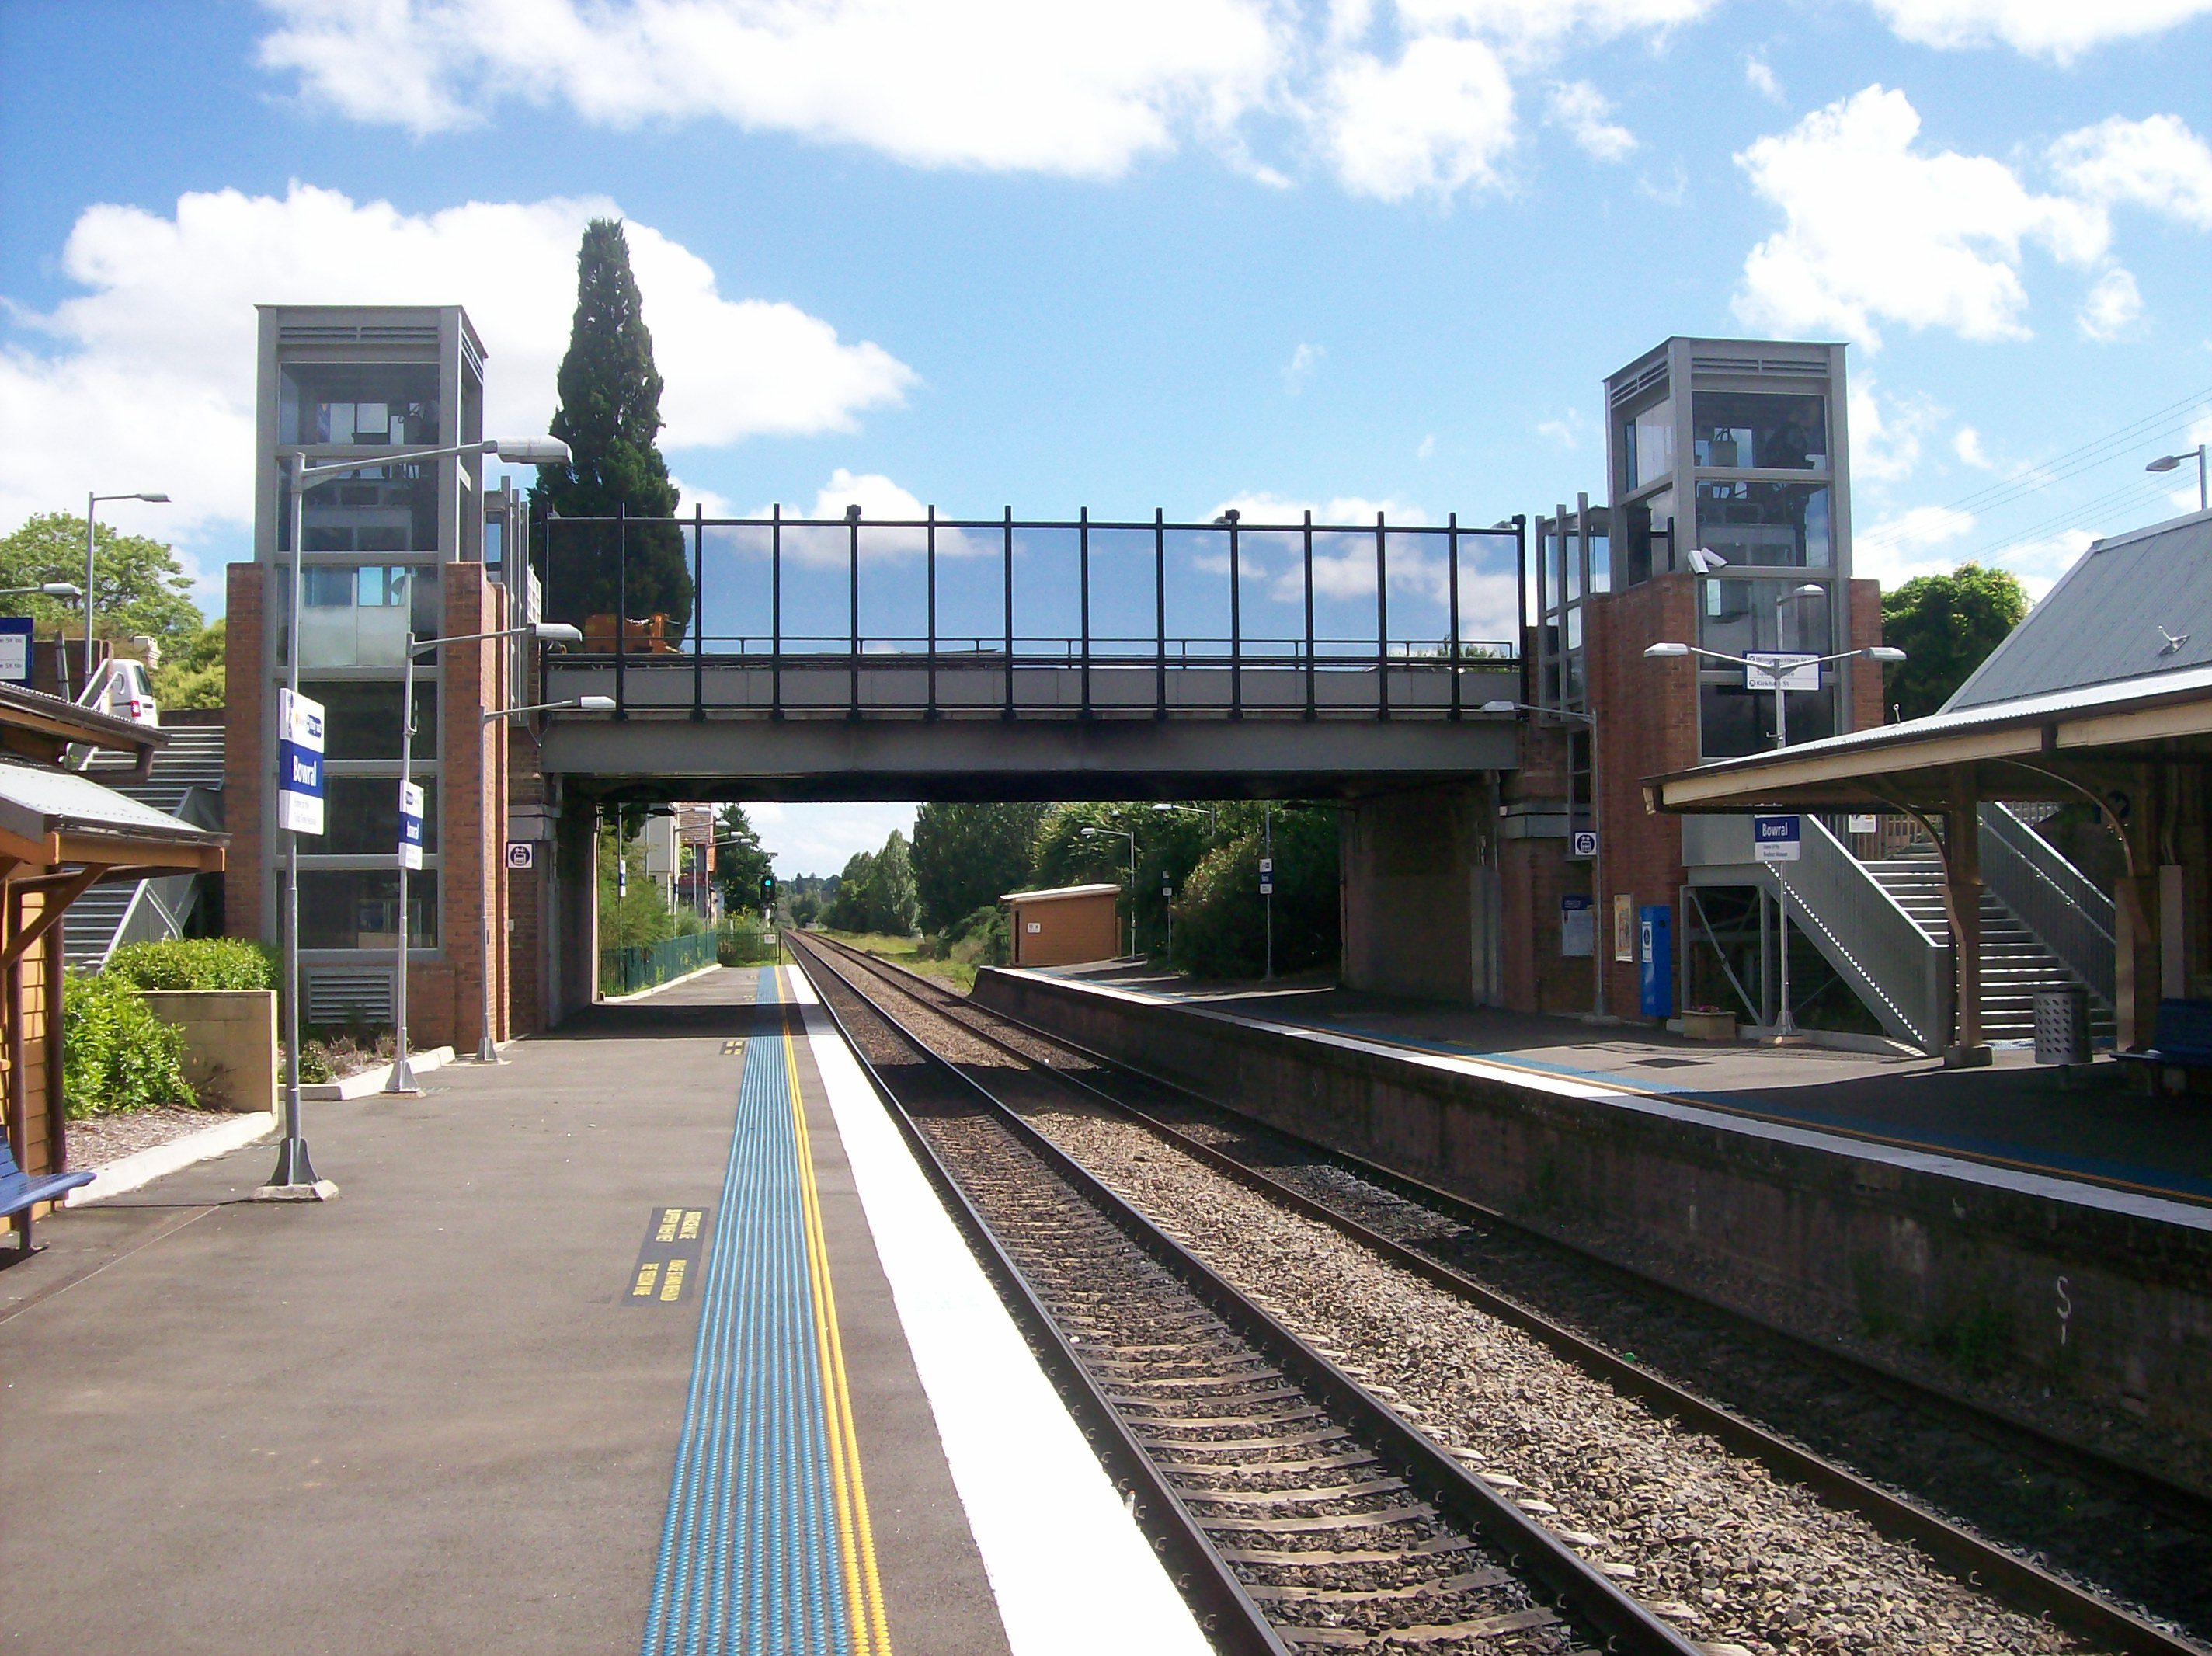 IMAGE(https://upload.wikimedia.org/wikipedia/commons/3/3b/Bowral_railway_station_bridge_south_end.JPG)